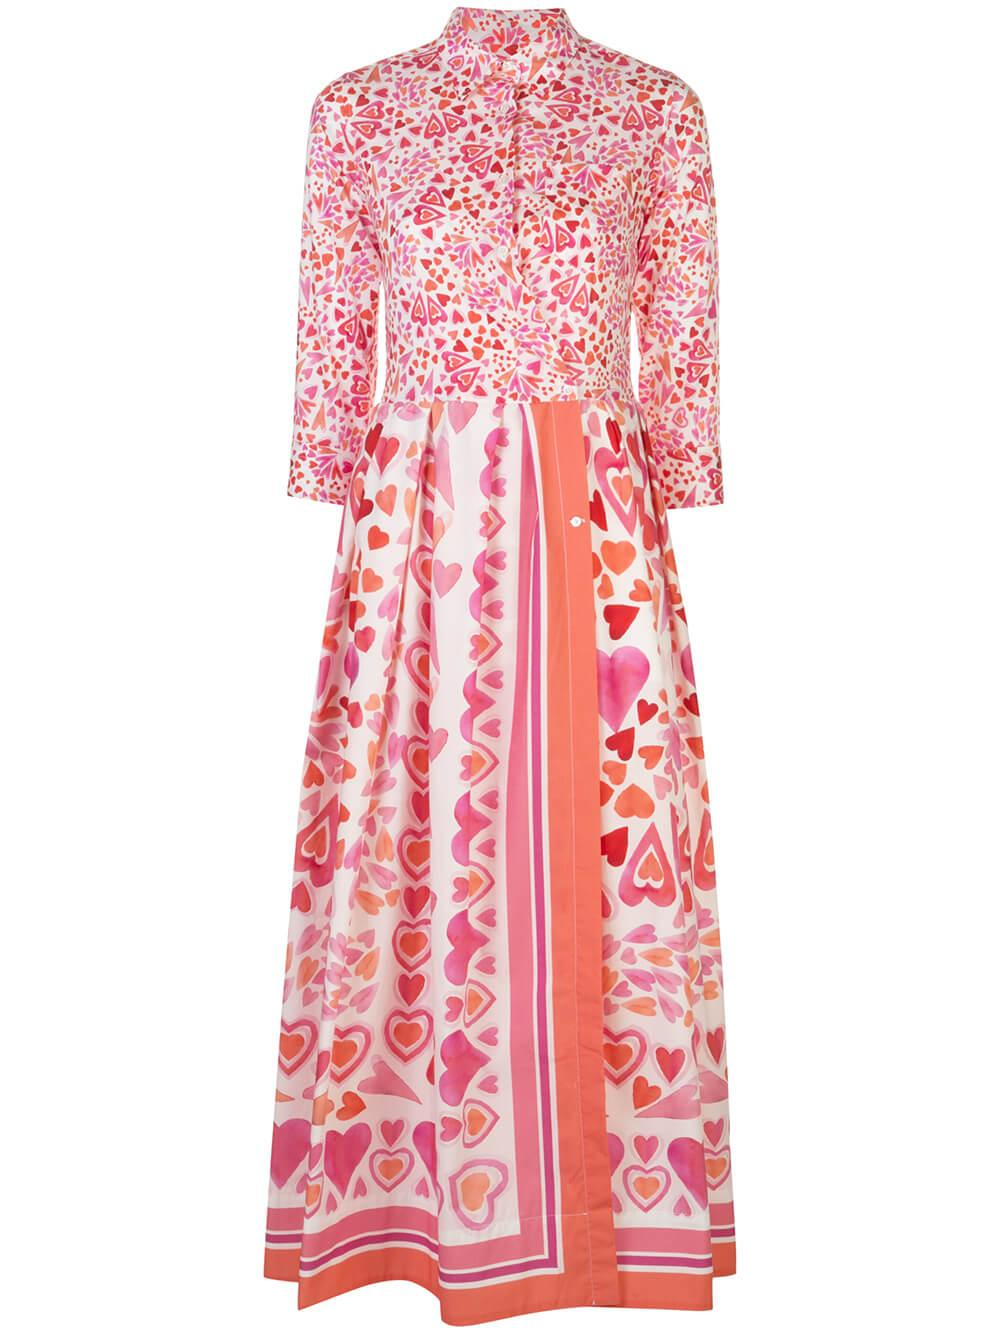 3/4 Sleeve Heart Print Maxi Dress Item # 8EL96-34